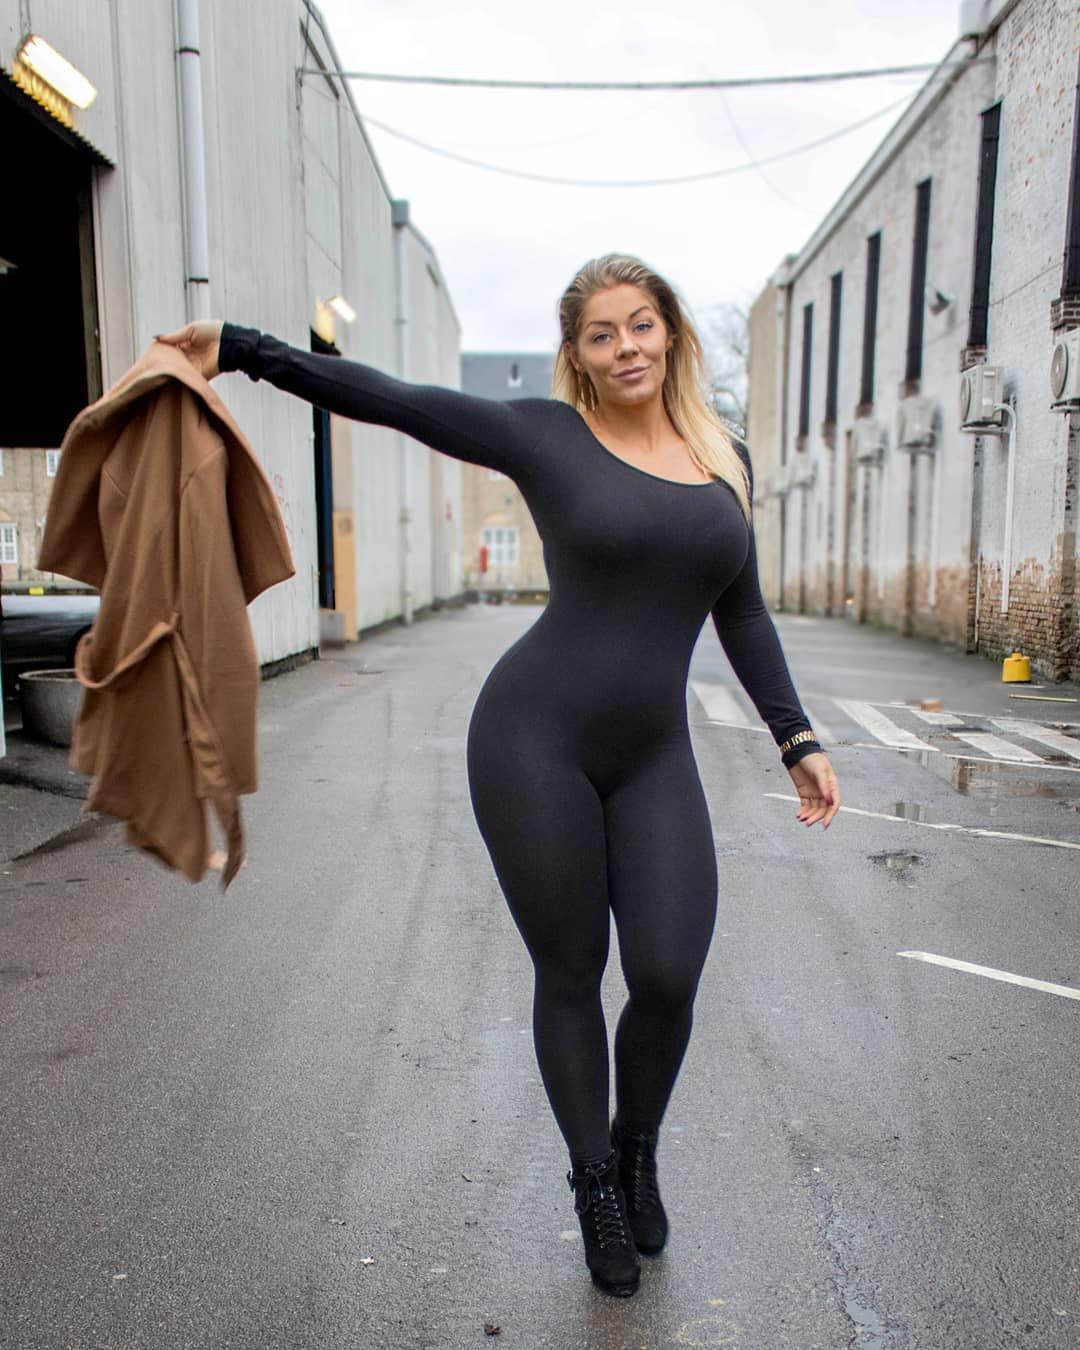 Naked Truth Of Mia Sand - Age, Measurements, Boyfriend, Wiki